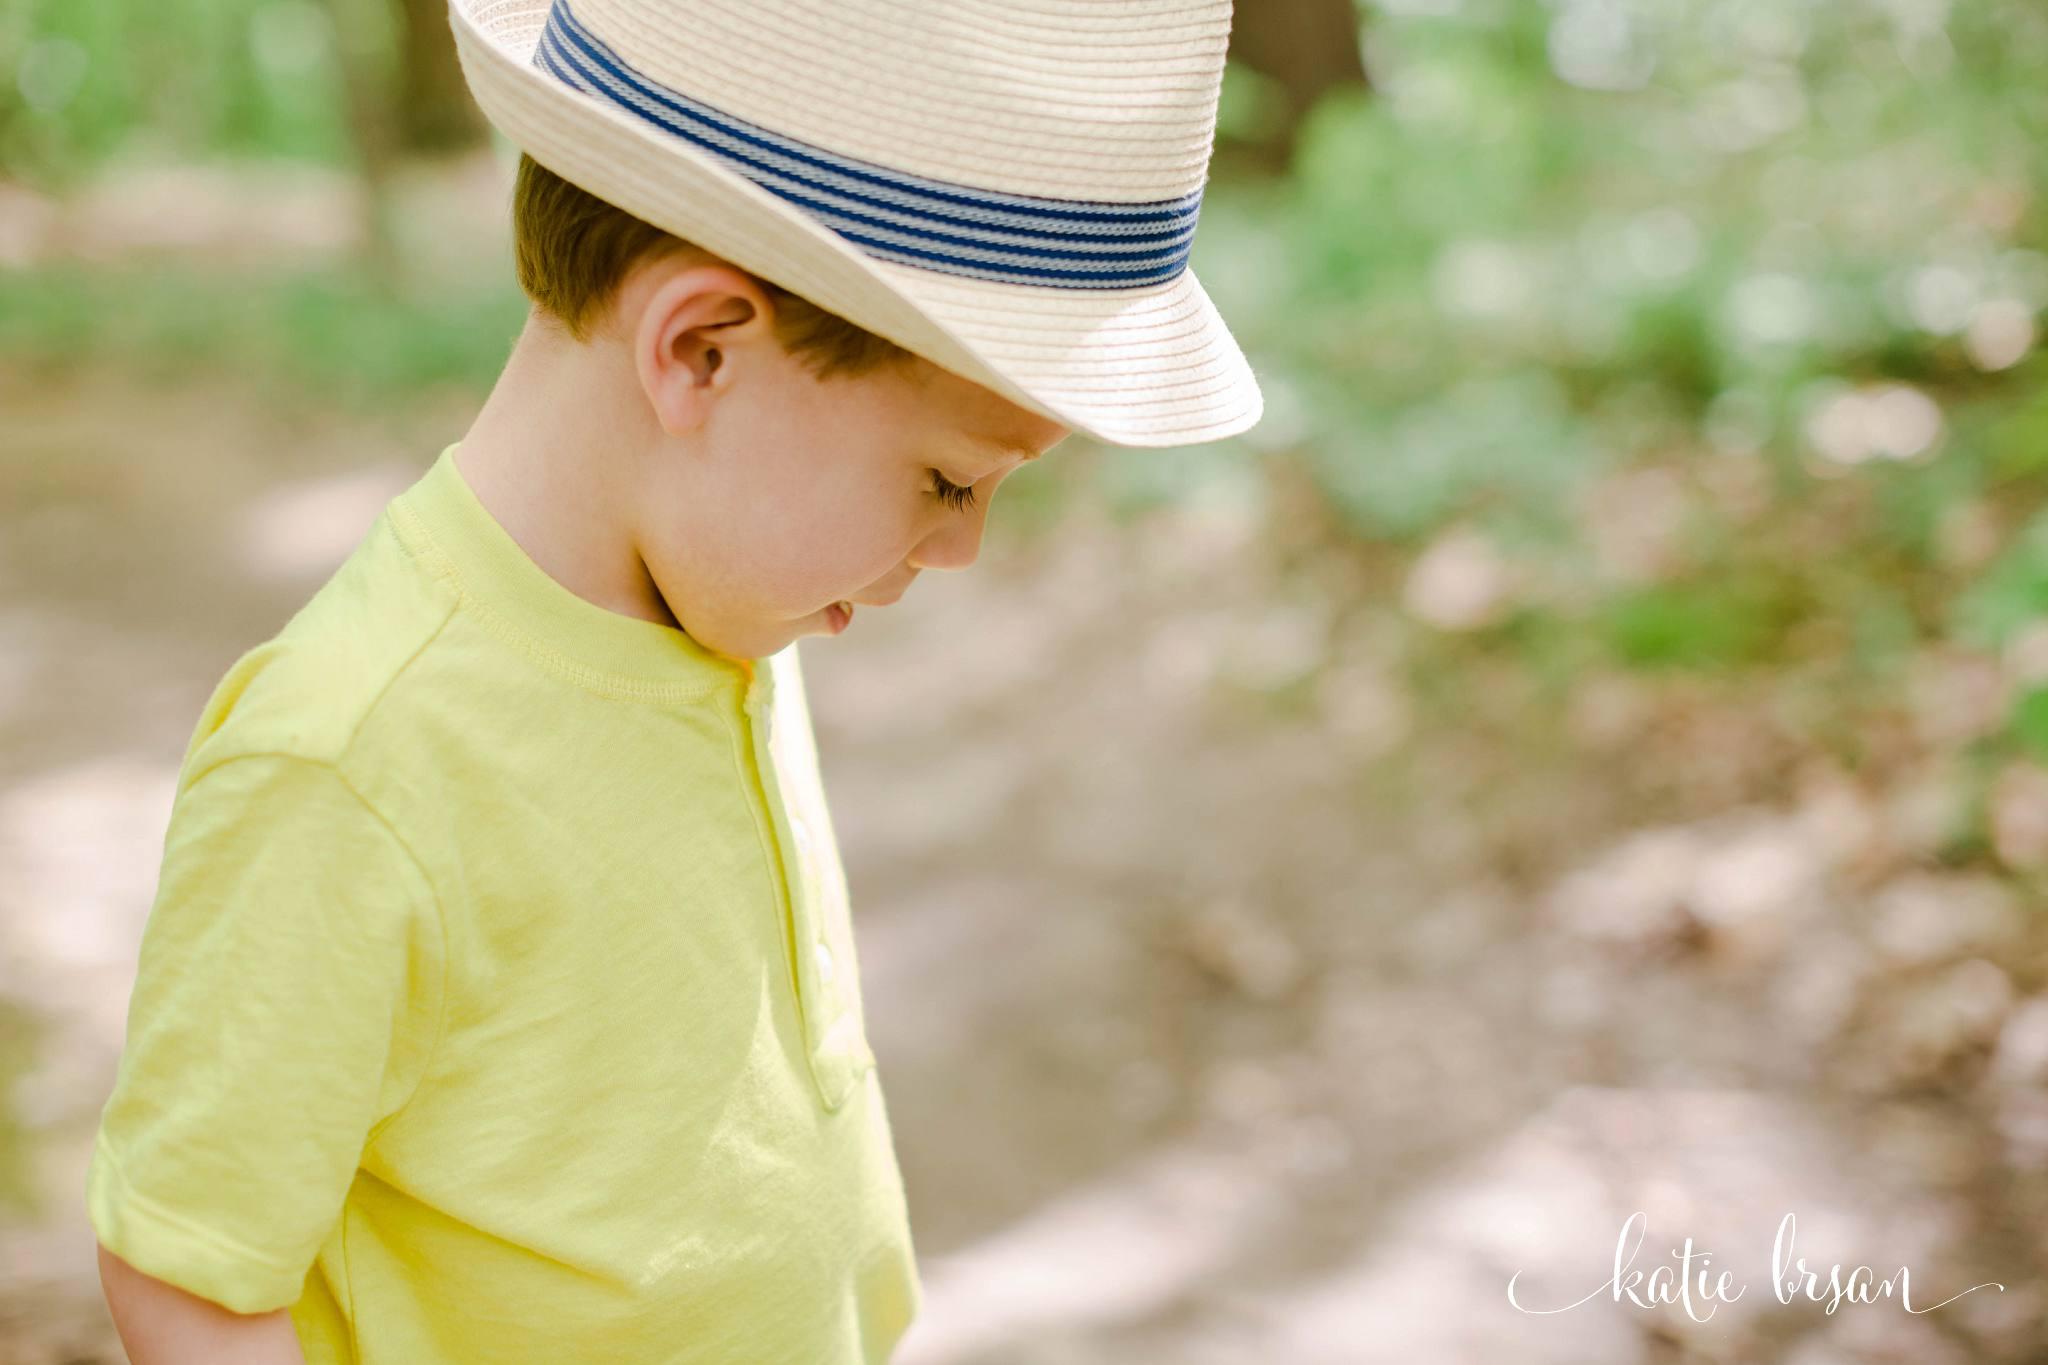 KatieBrsan-Shorewood-ChildPhotographer_0574.jpg